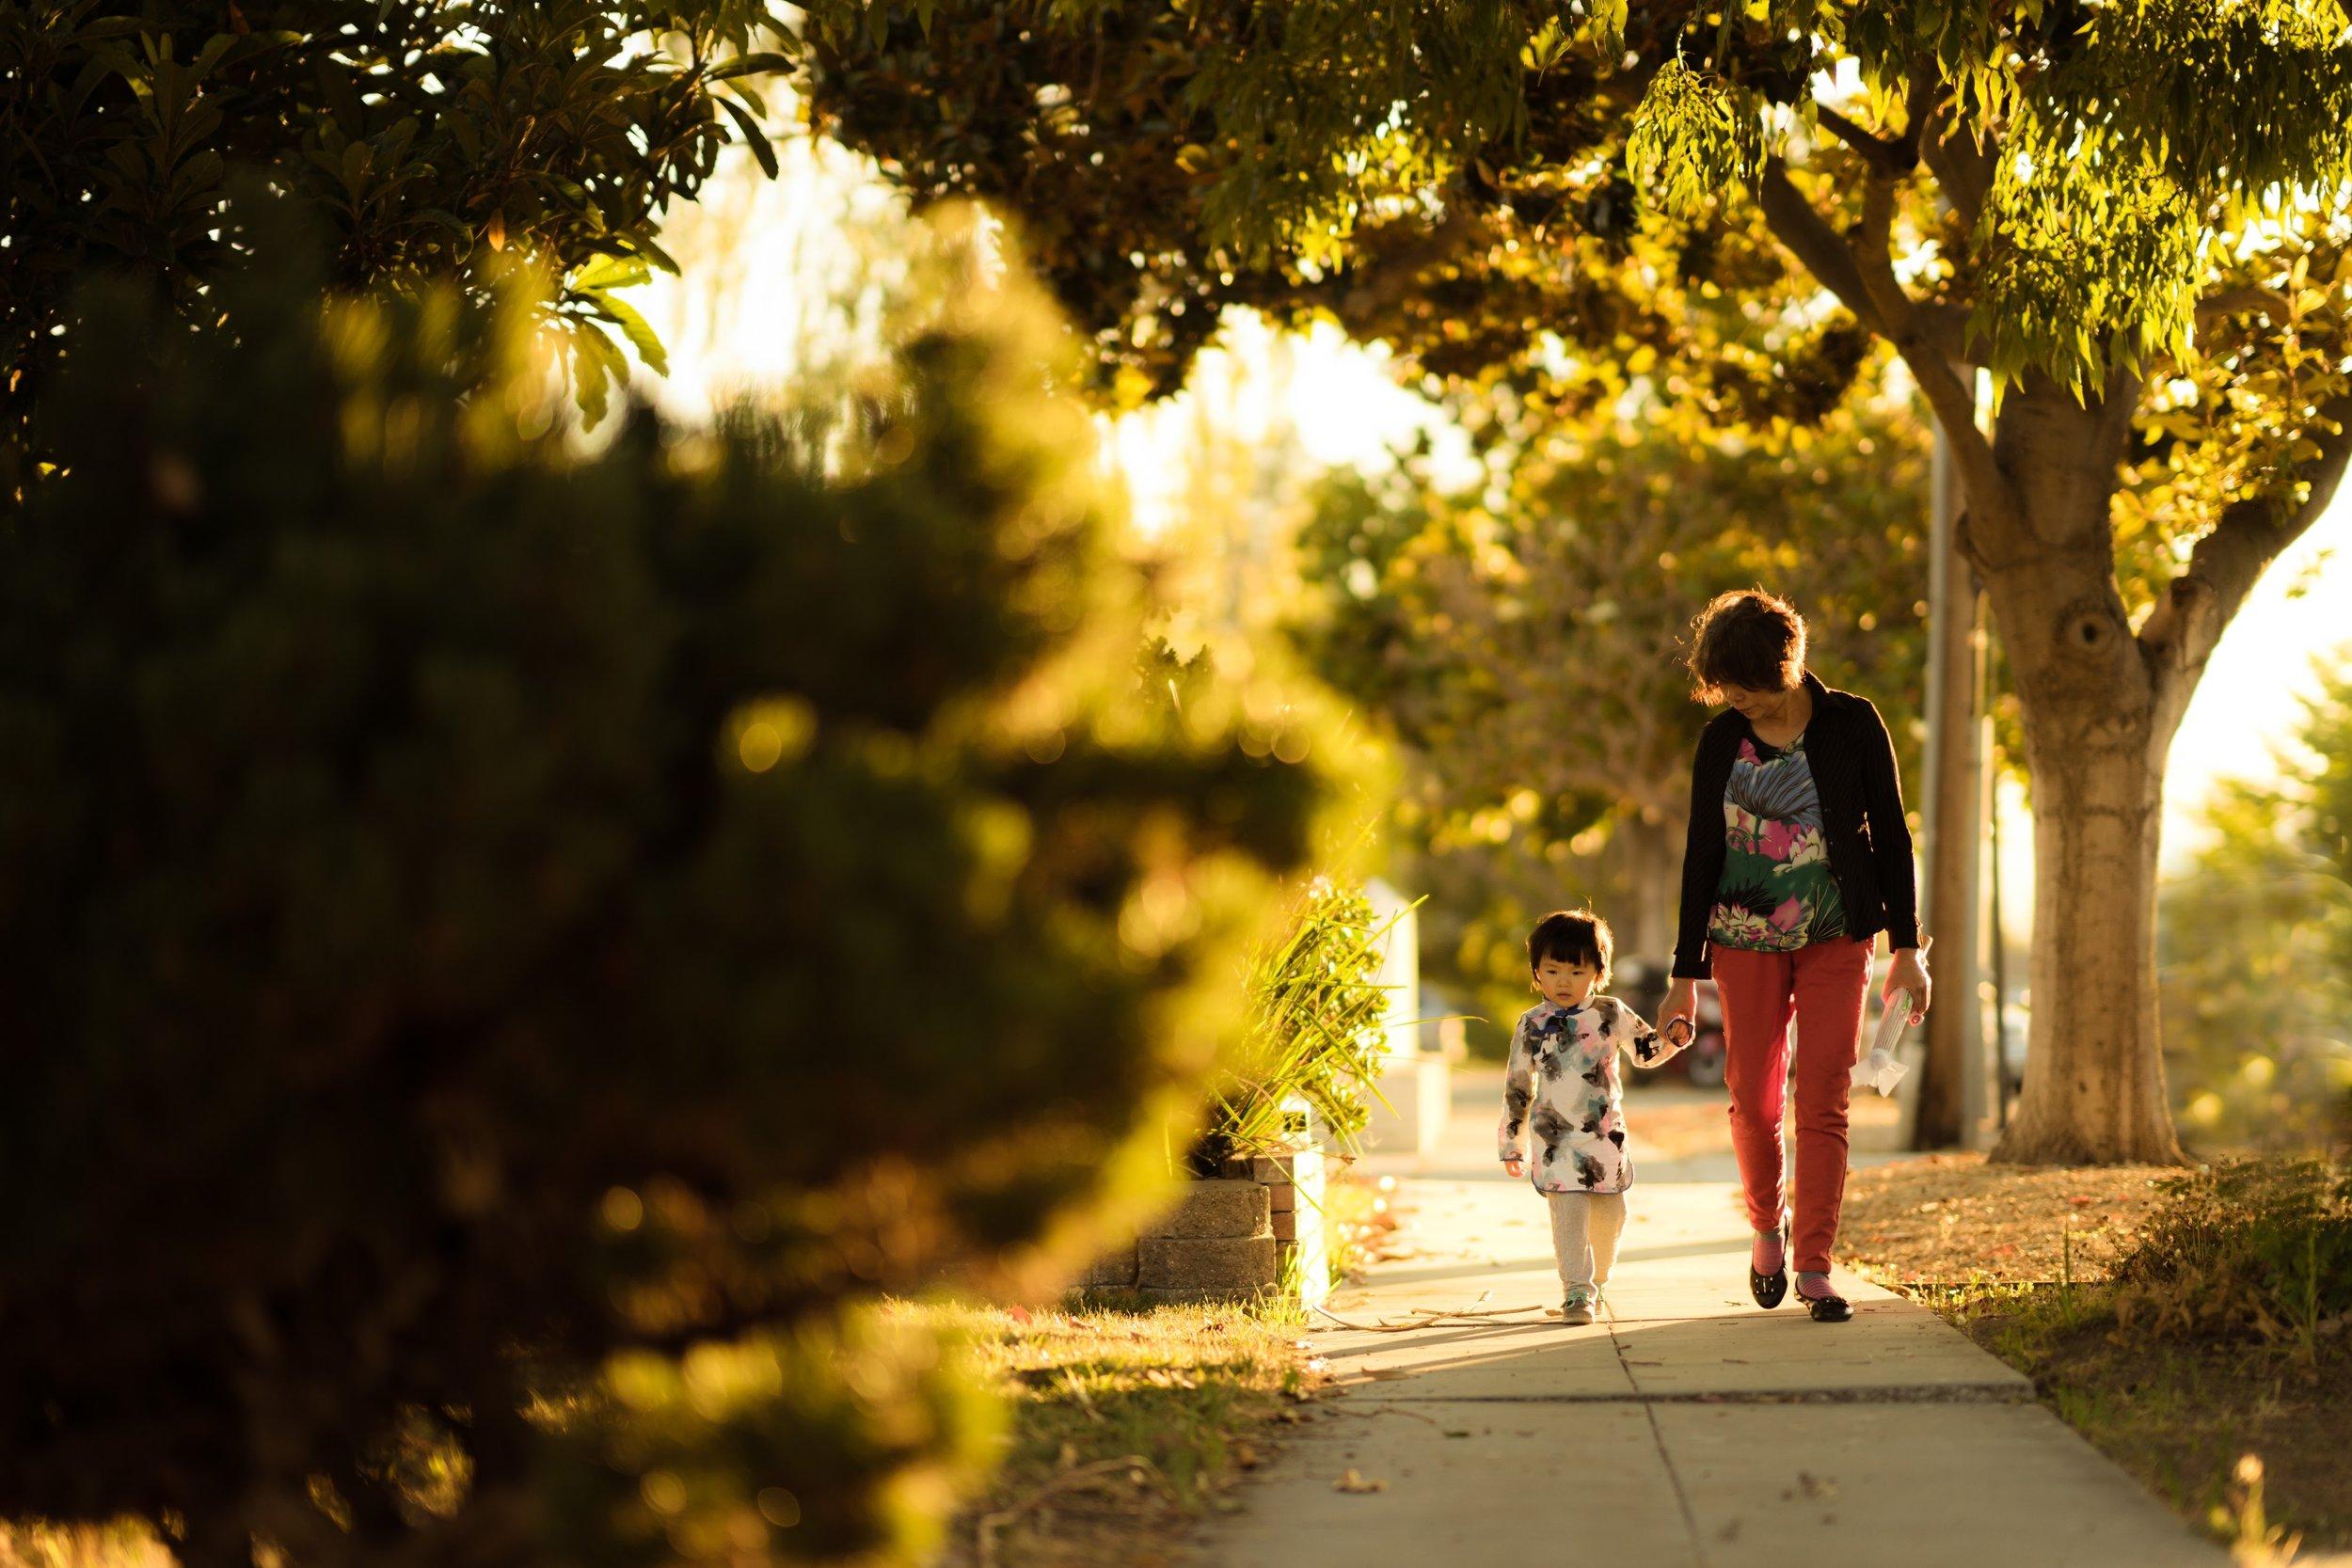 mom and child walking.jpg